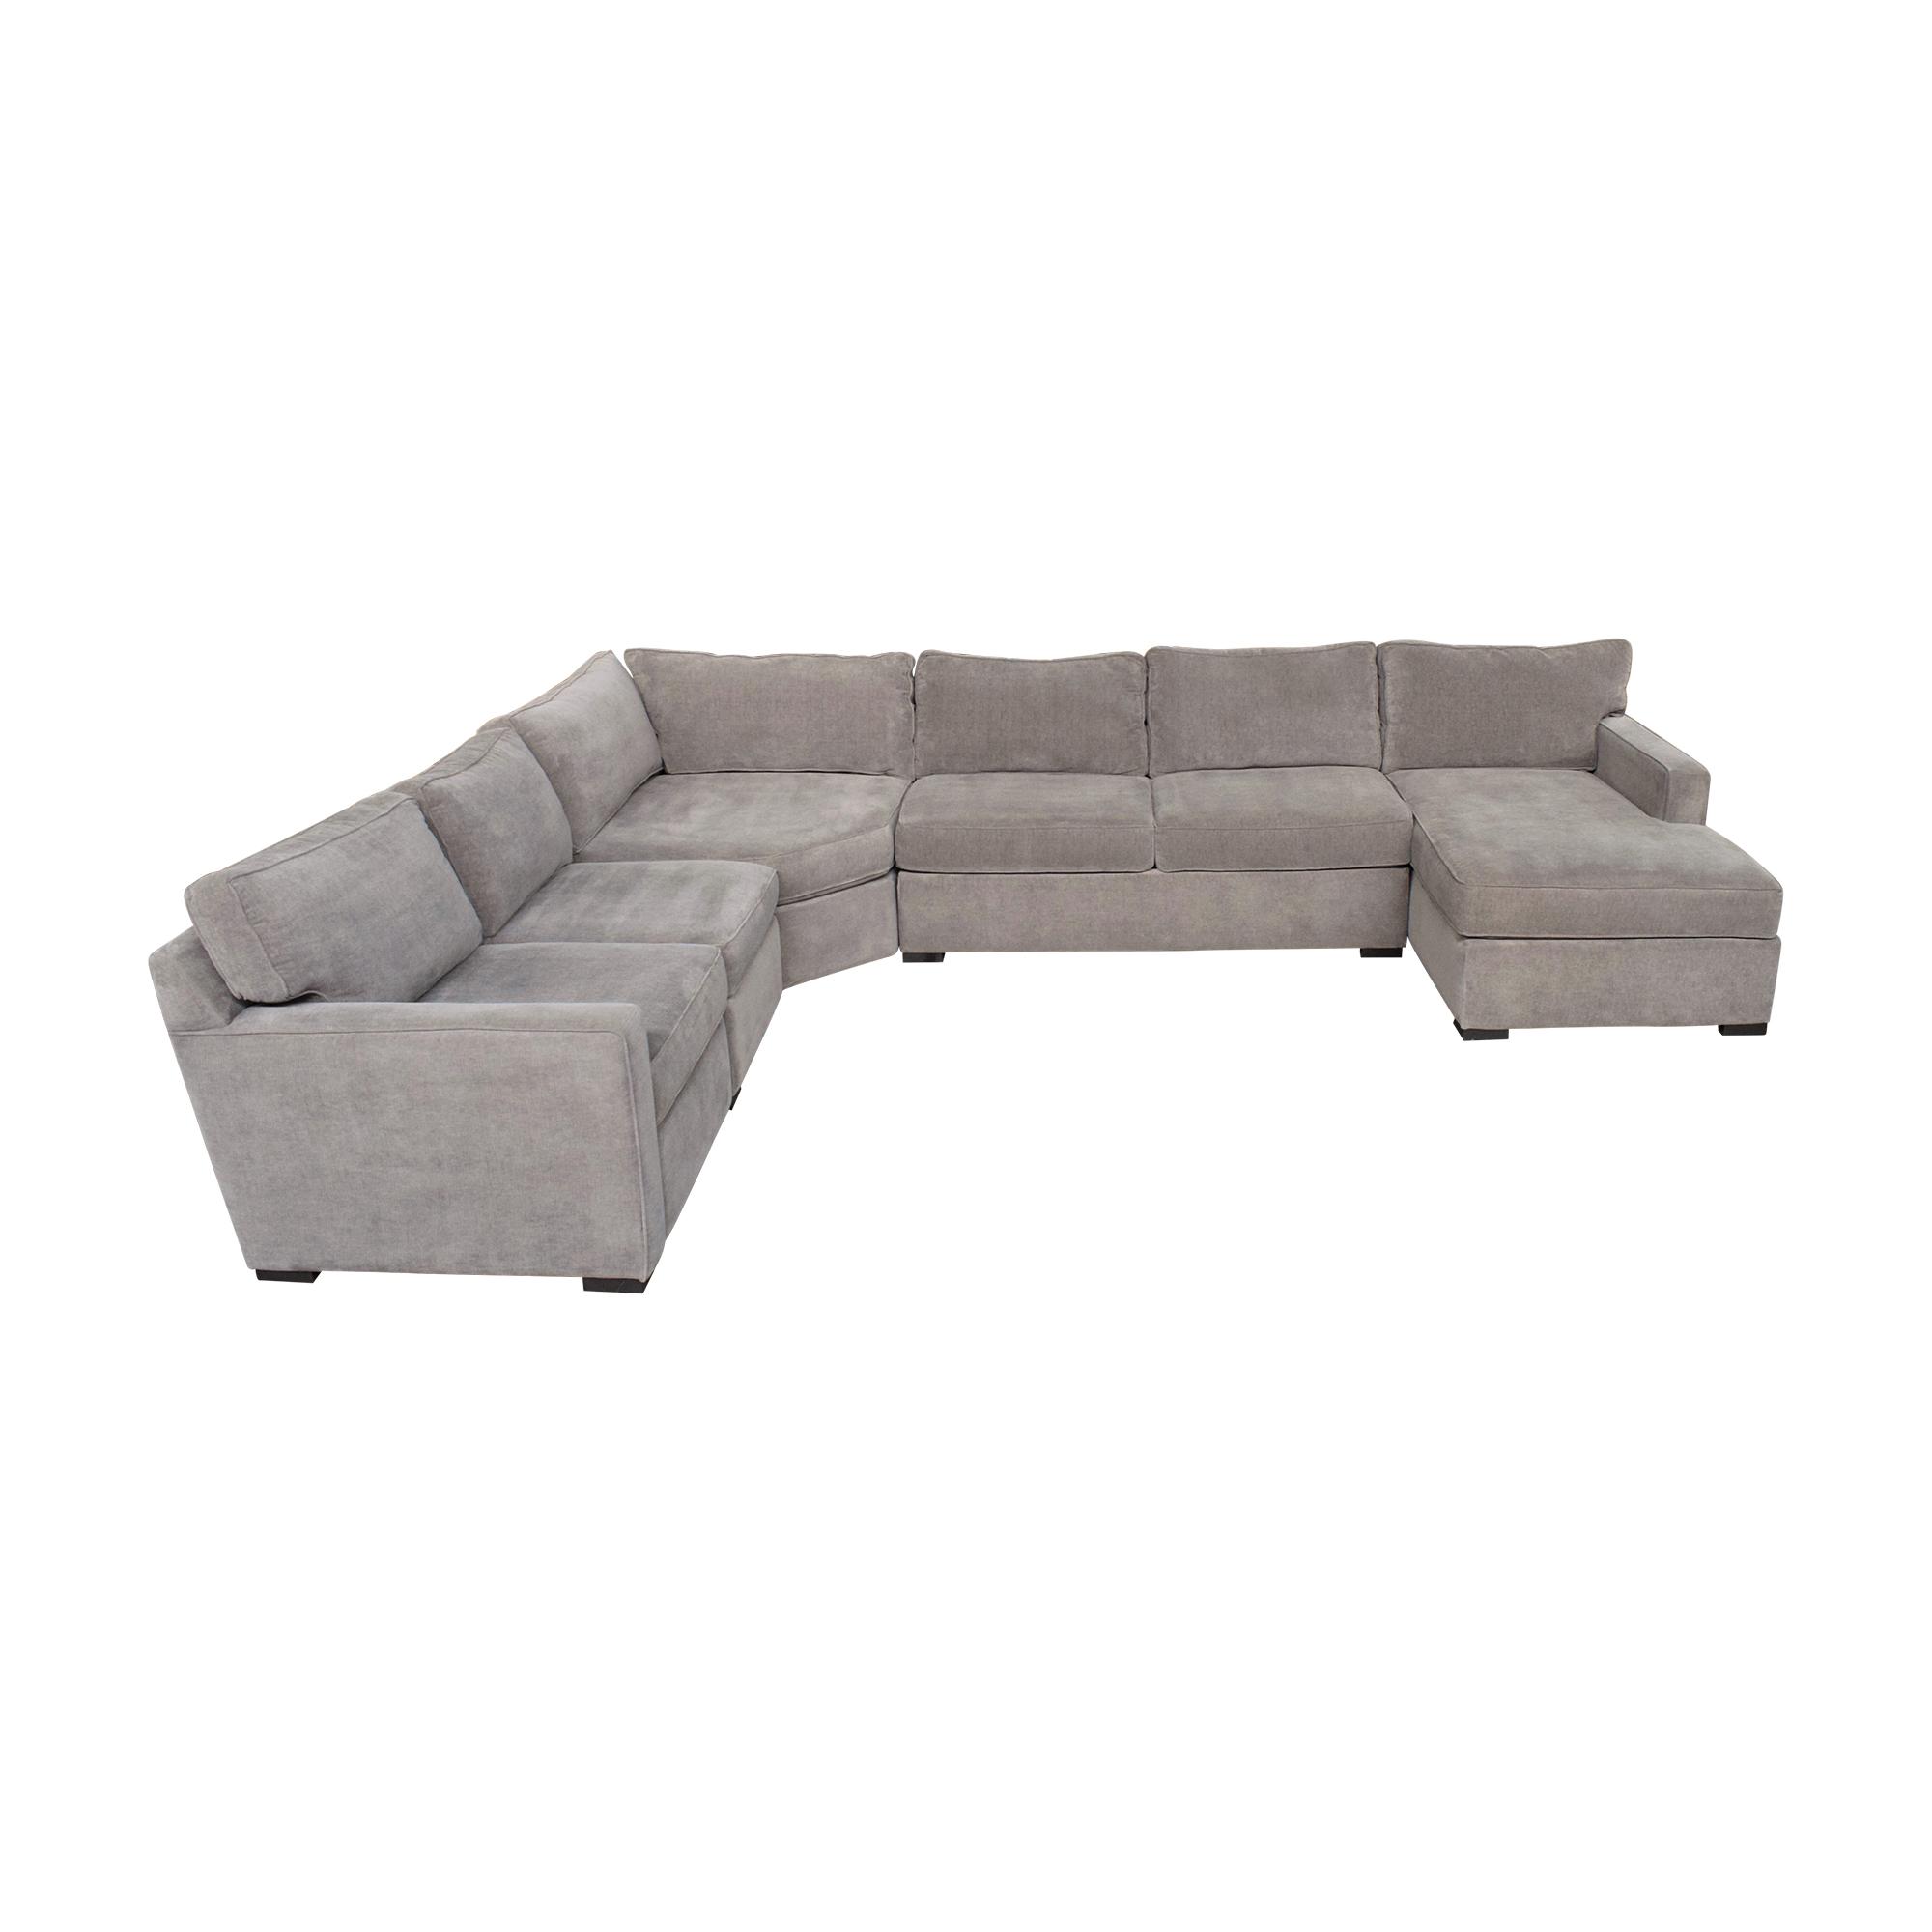 Macy's U-Shaped Chaise Sectional Sofa Macy's